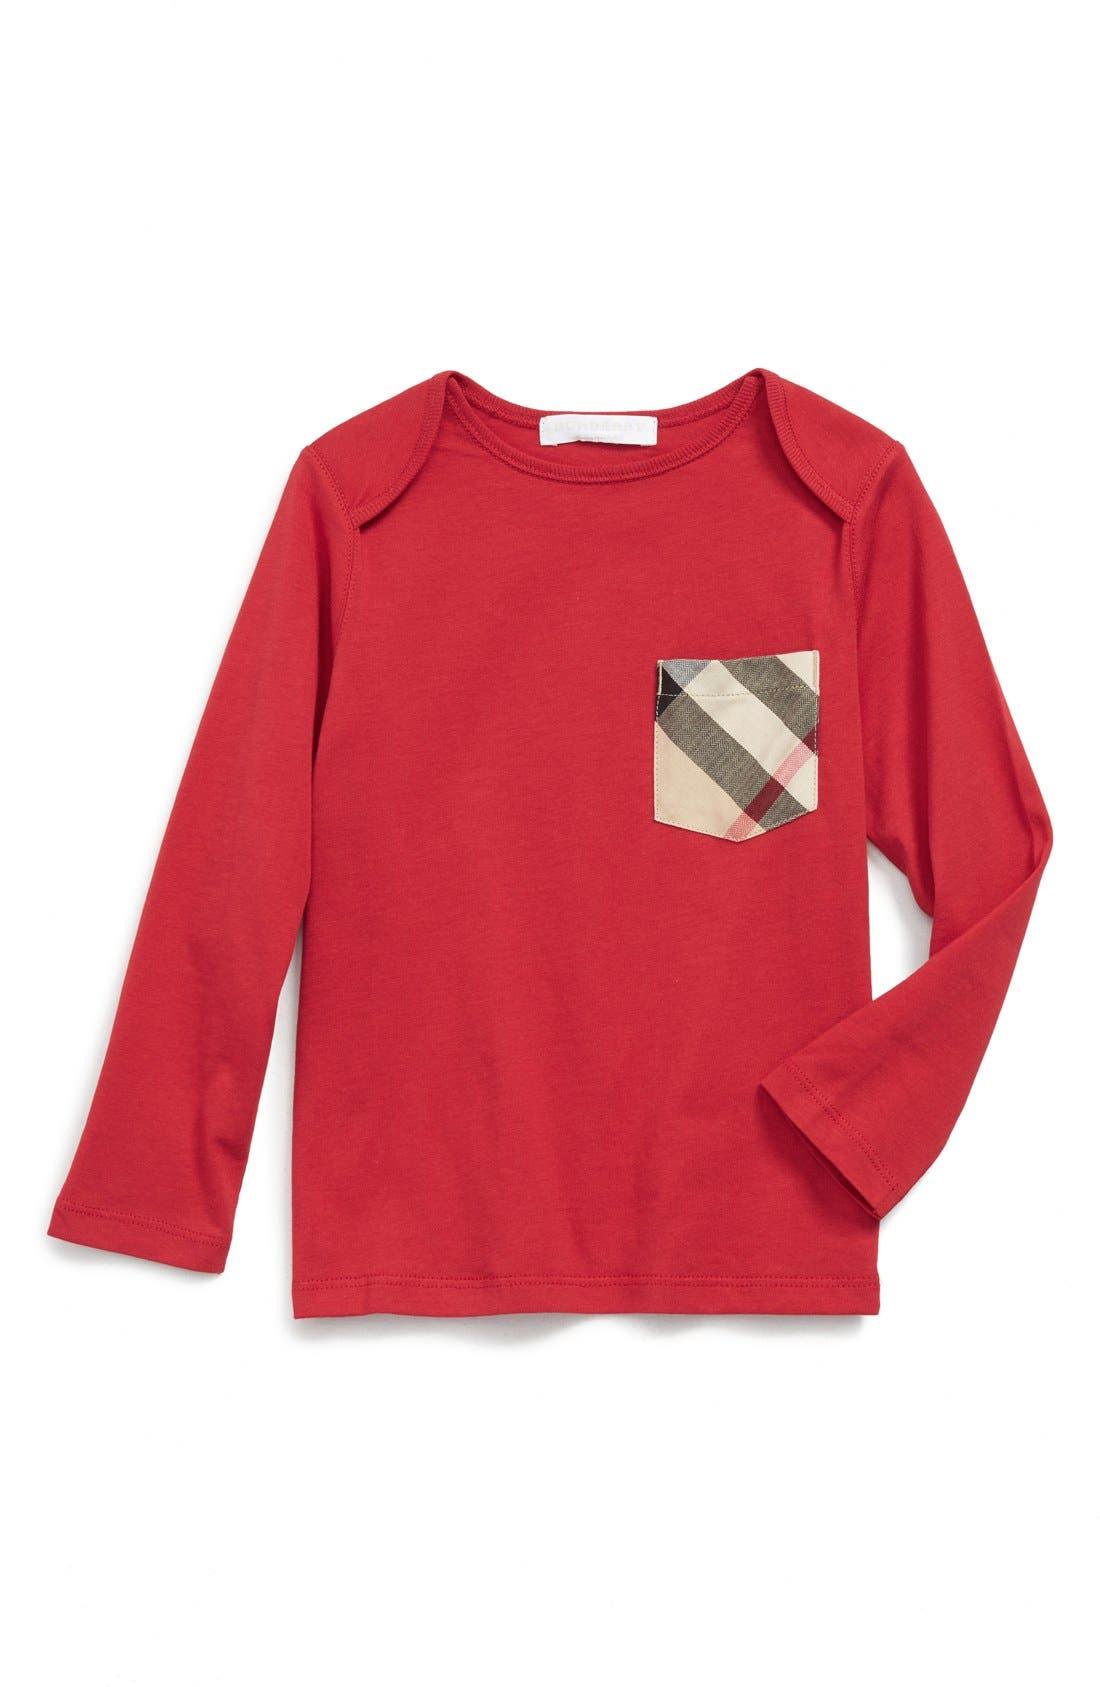 'Callum' Check Print Chest Pocket T-Shirt,                         Main,                         color, Military Red